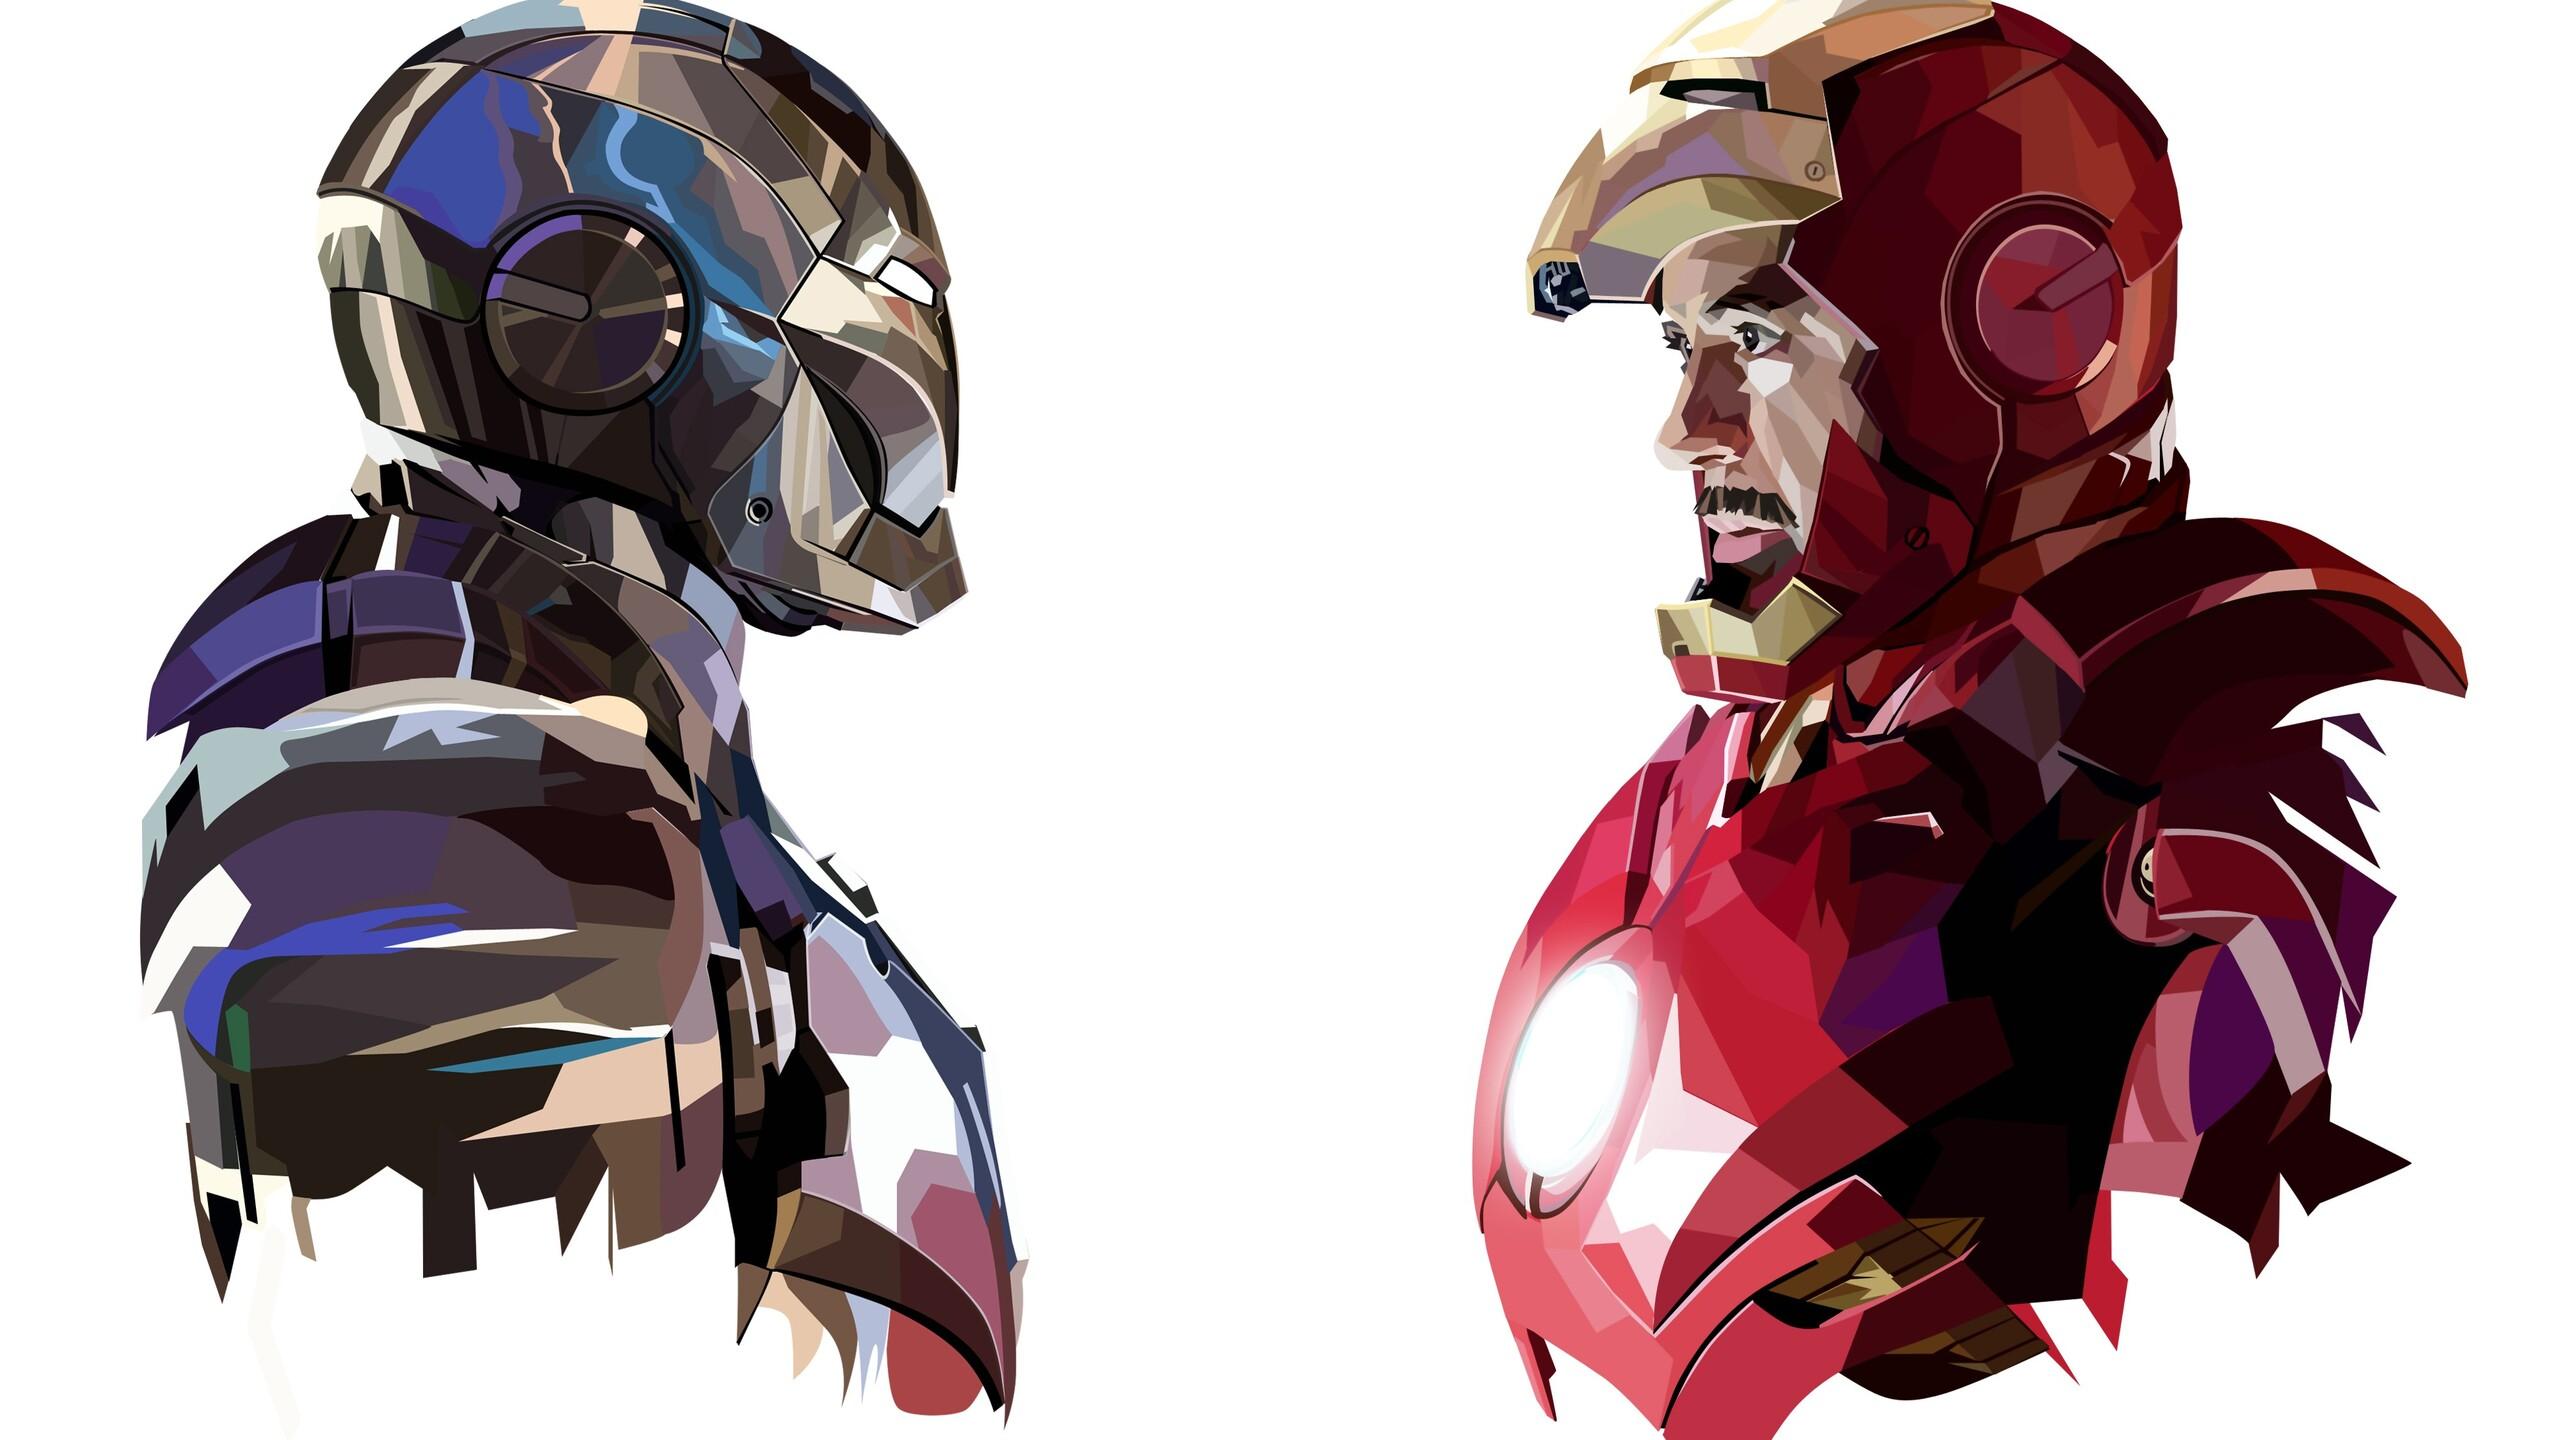 Iron Man 3d Wallpaper For Android 2560x1440 Tony Stark Iron Man Art 1440p Resolution Hd 4k